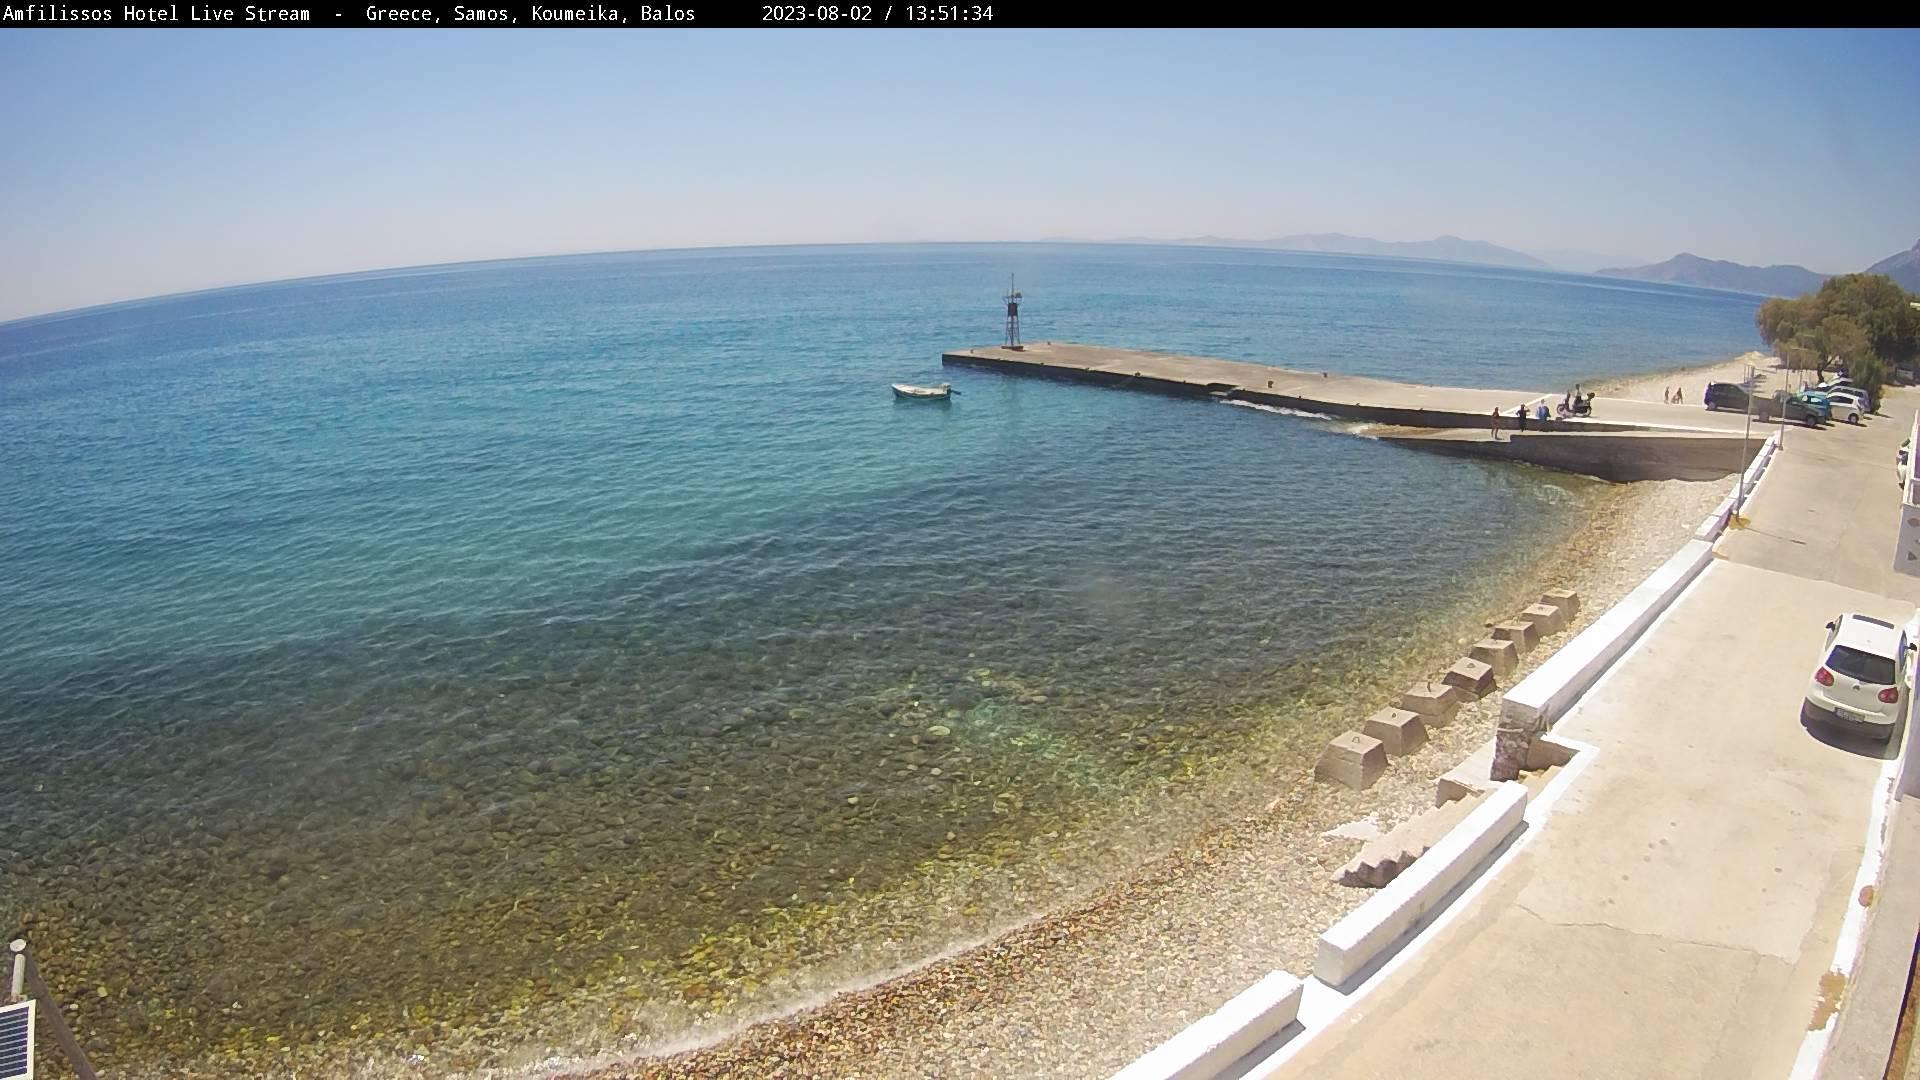 Webcam Samos (Karlovassi)